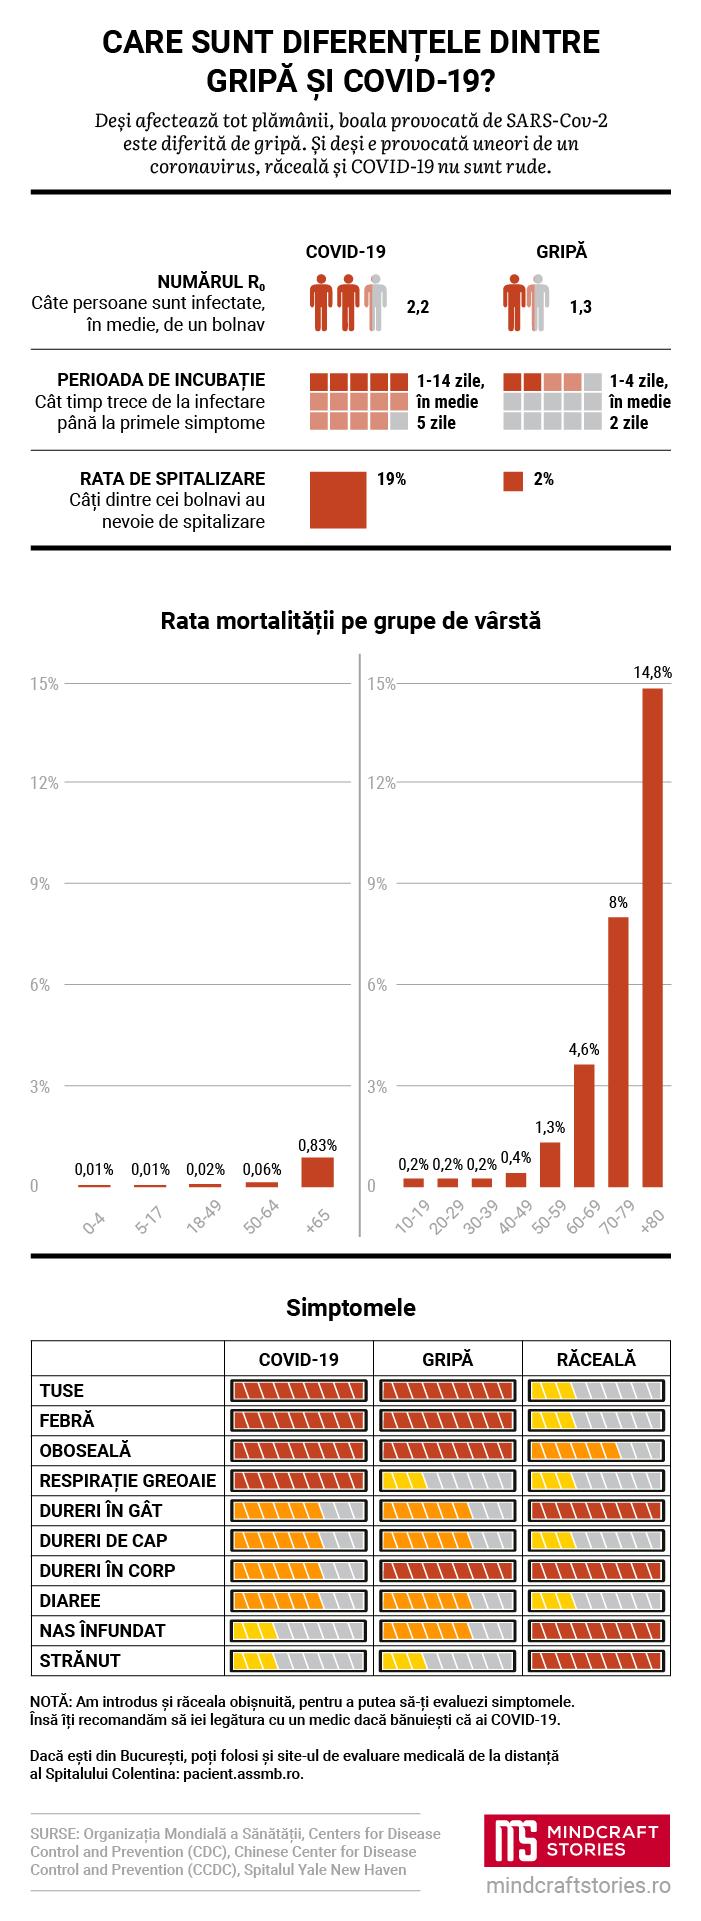 Infografic comparativ COVID-19 vs gripă